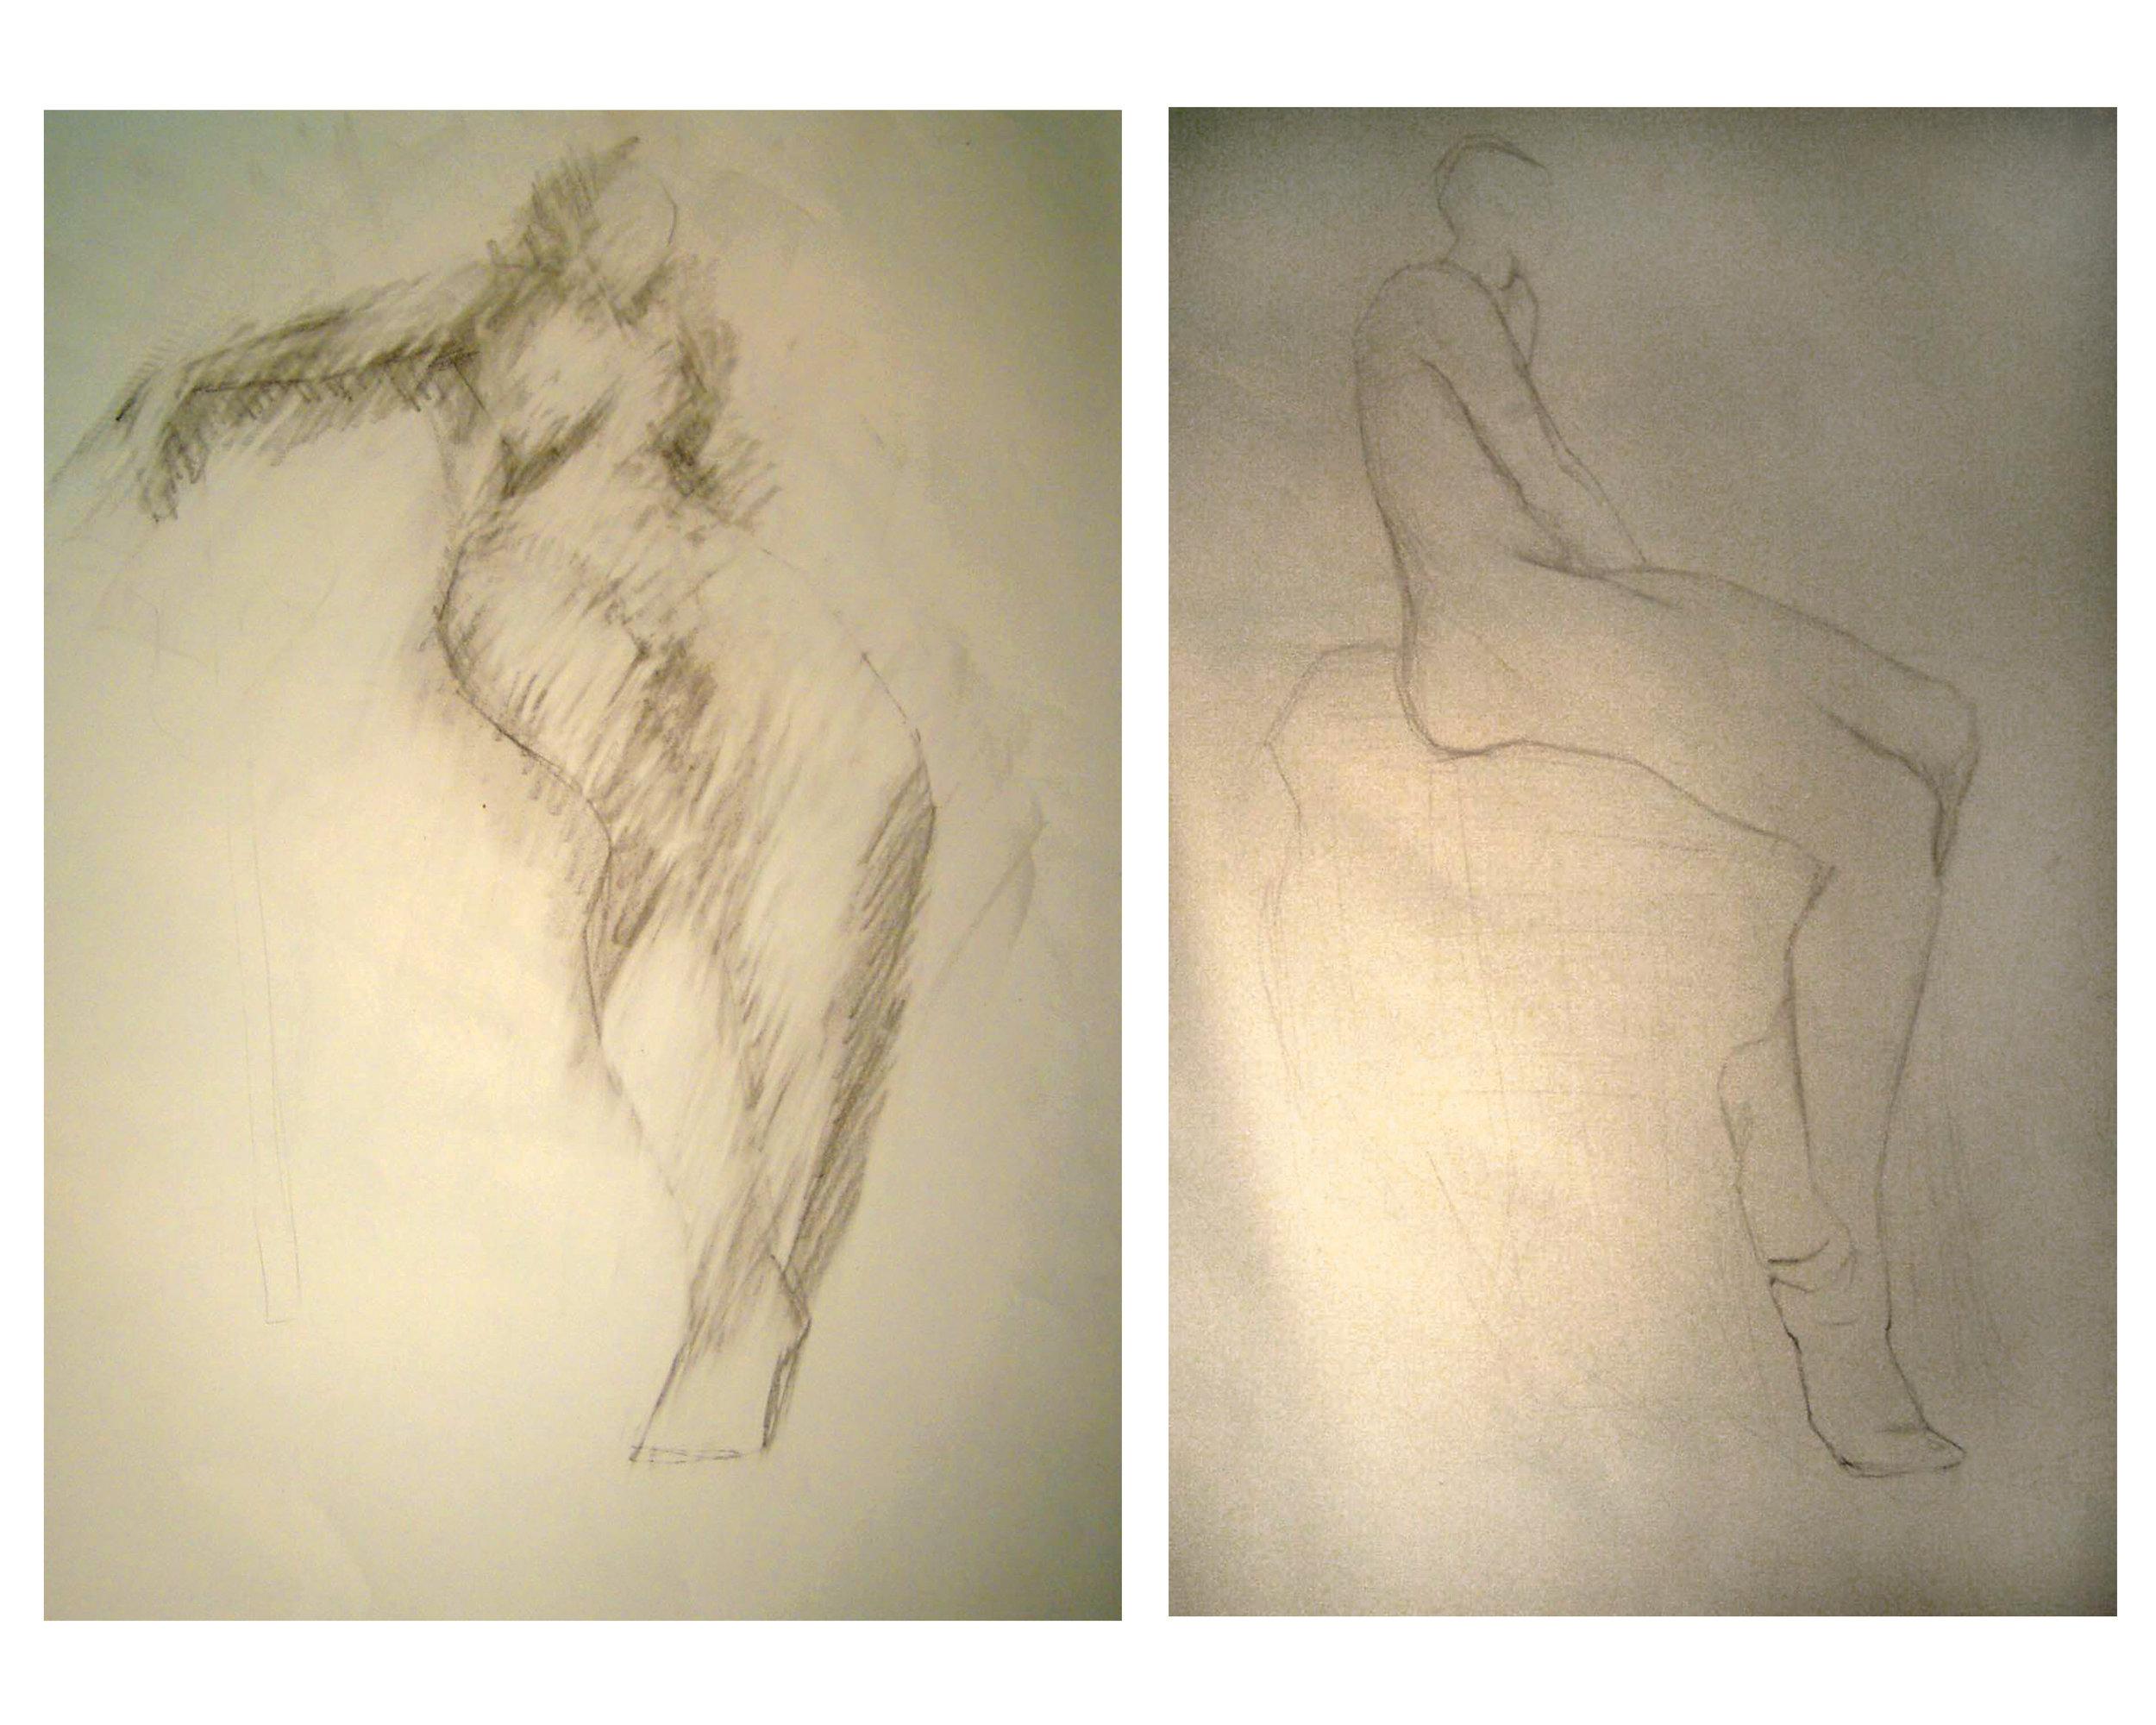 2life_drawing 2.jpg